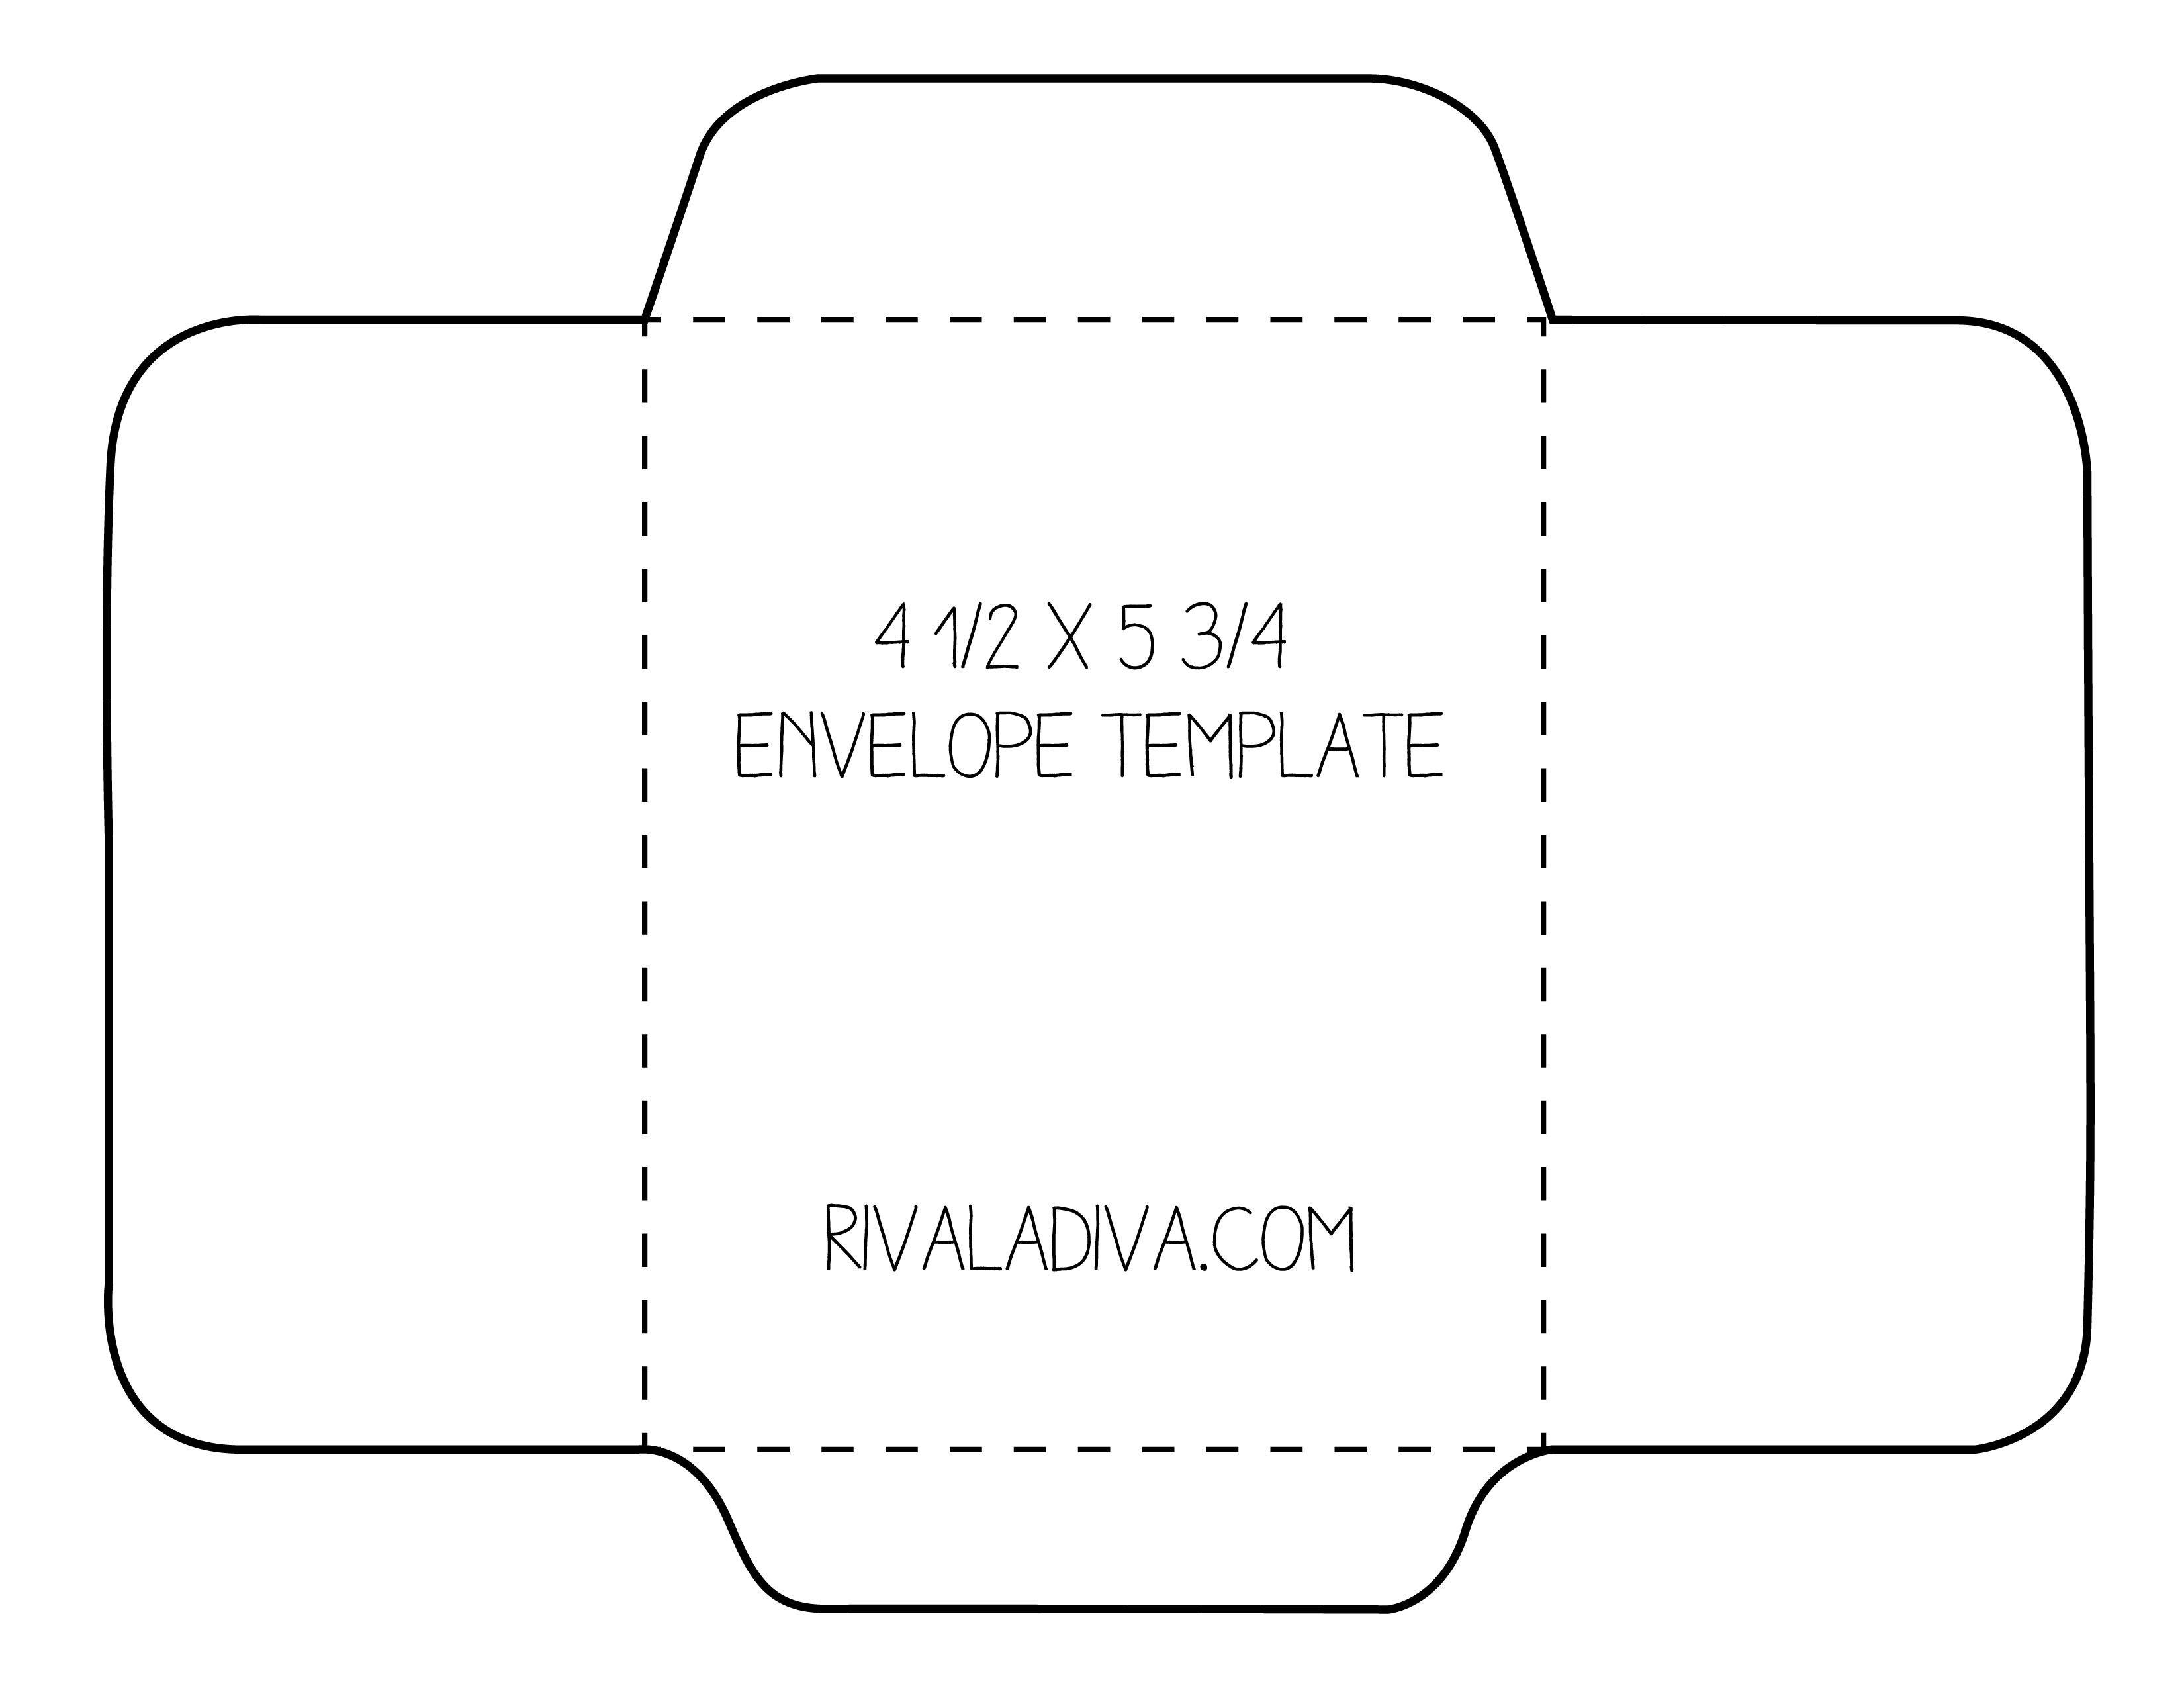 Envelope Template | Envelope Template For 8.5 X 11 Paper Diy - Free Printable Envelope Templates